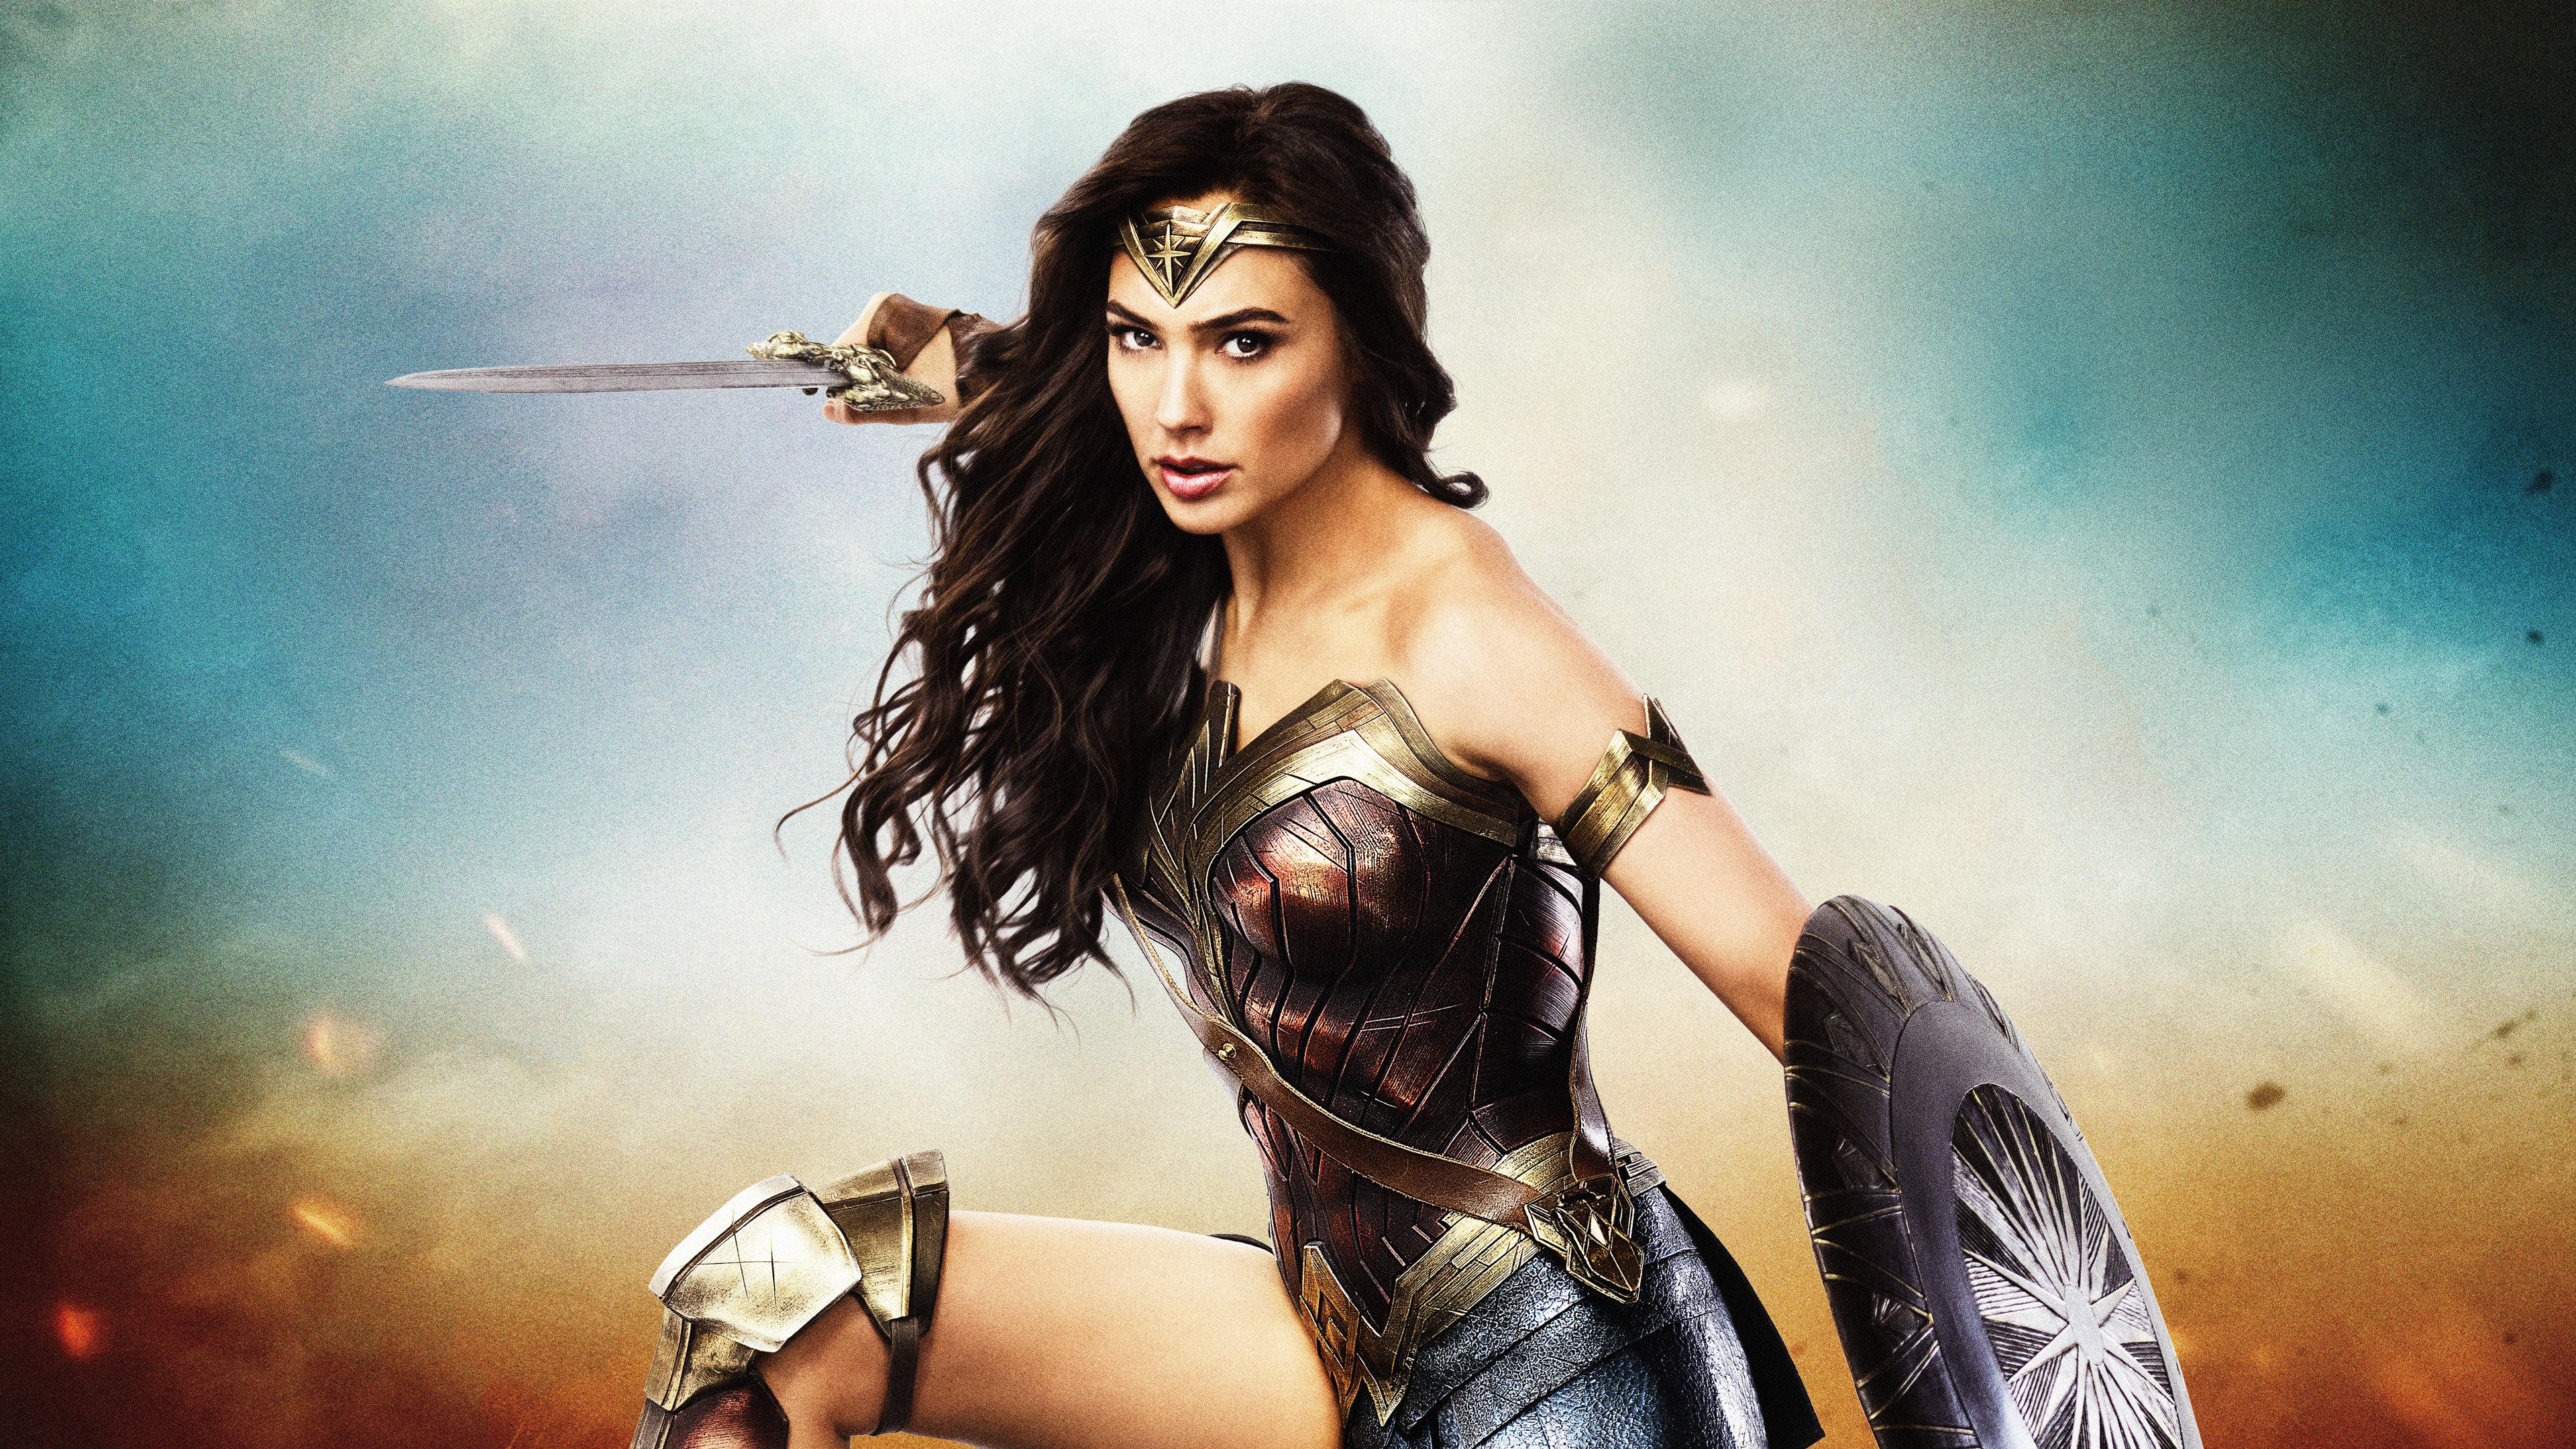 Wallpaper 4k Wonder Woman 8k Poster 4k Wallpapers 5k Wallpapers